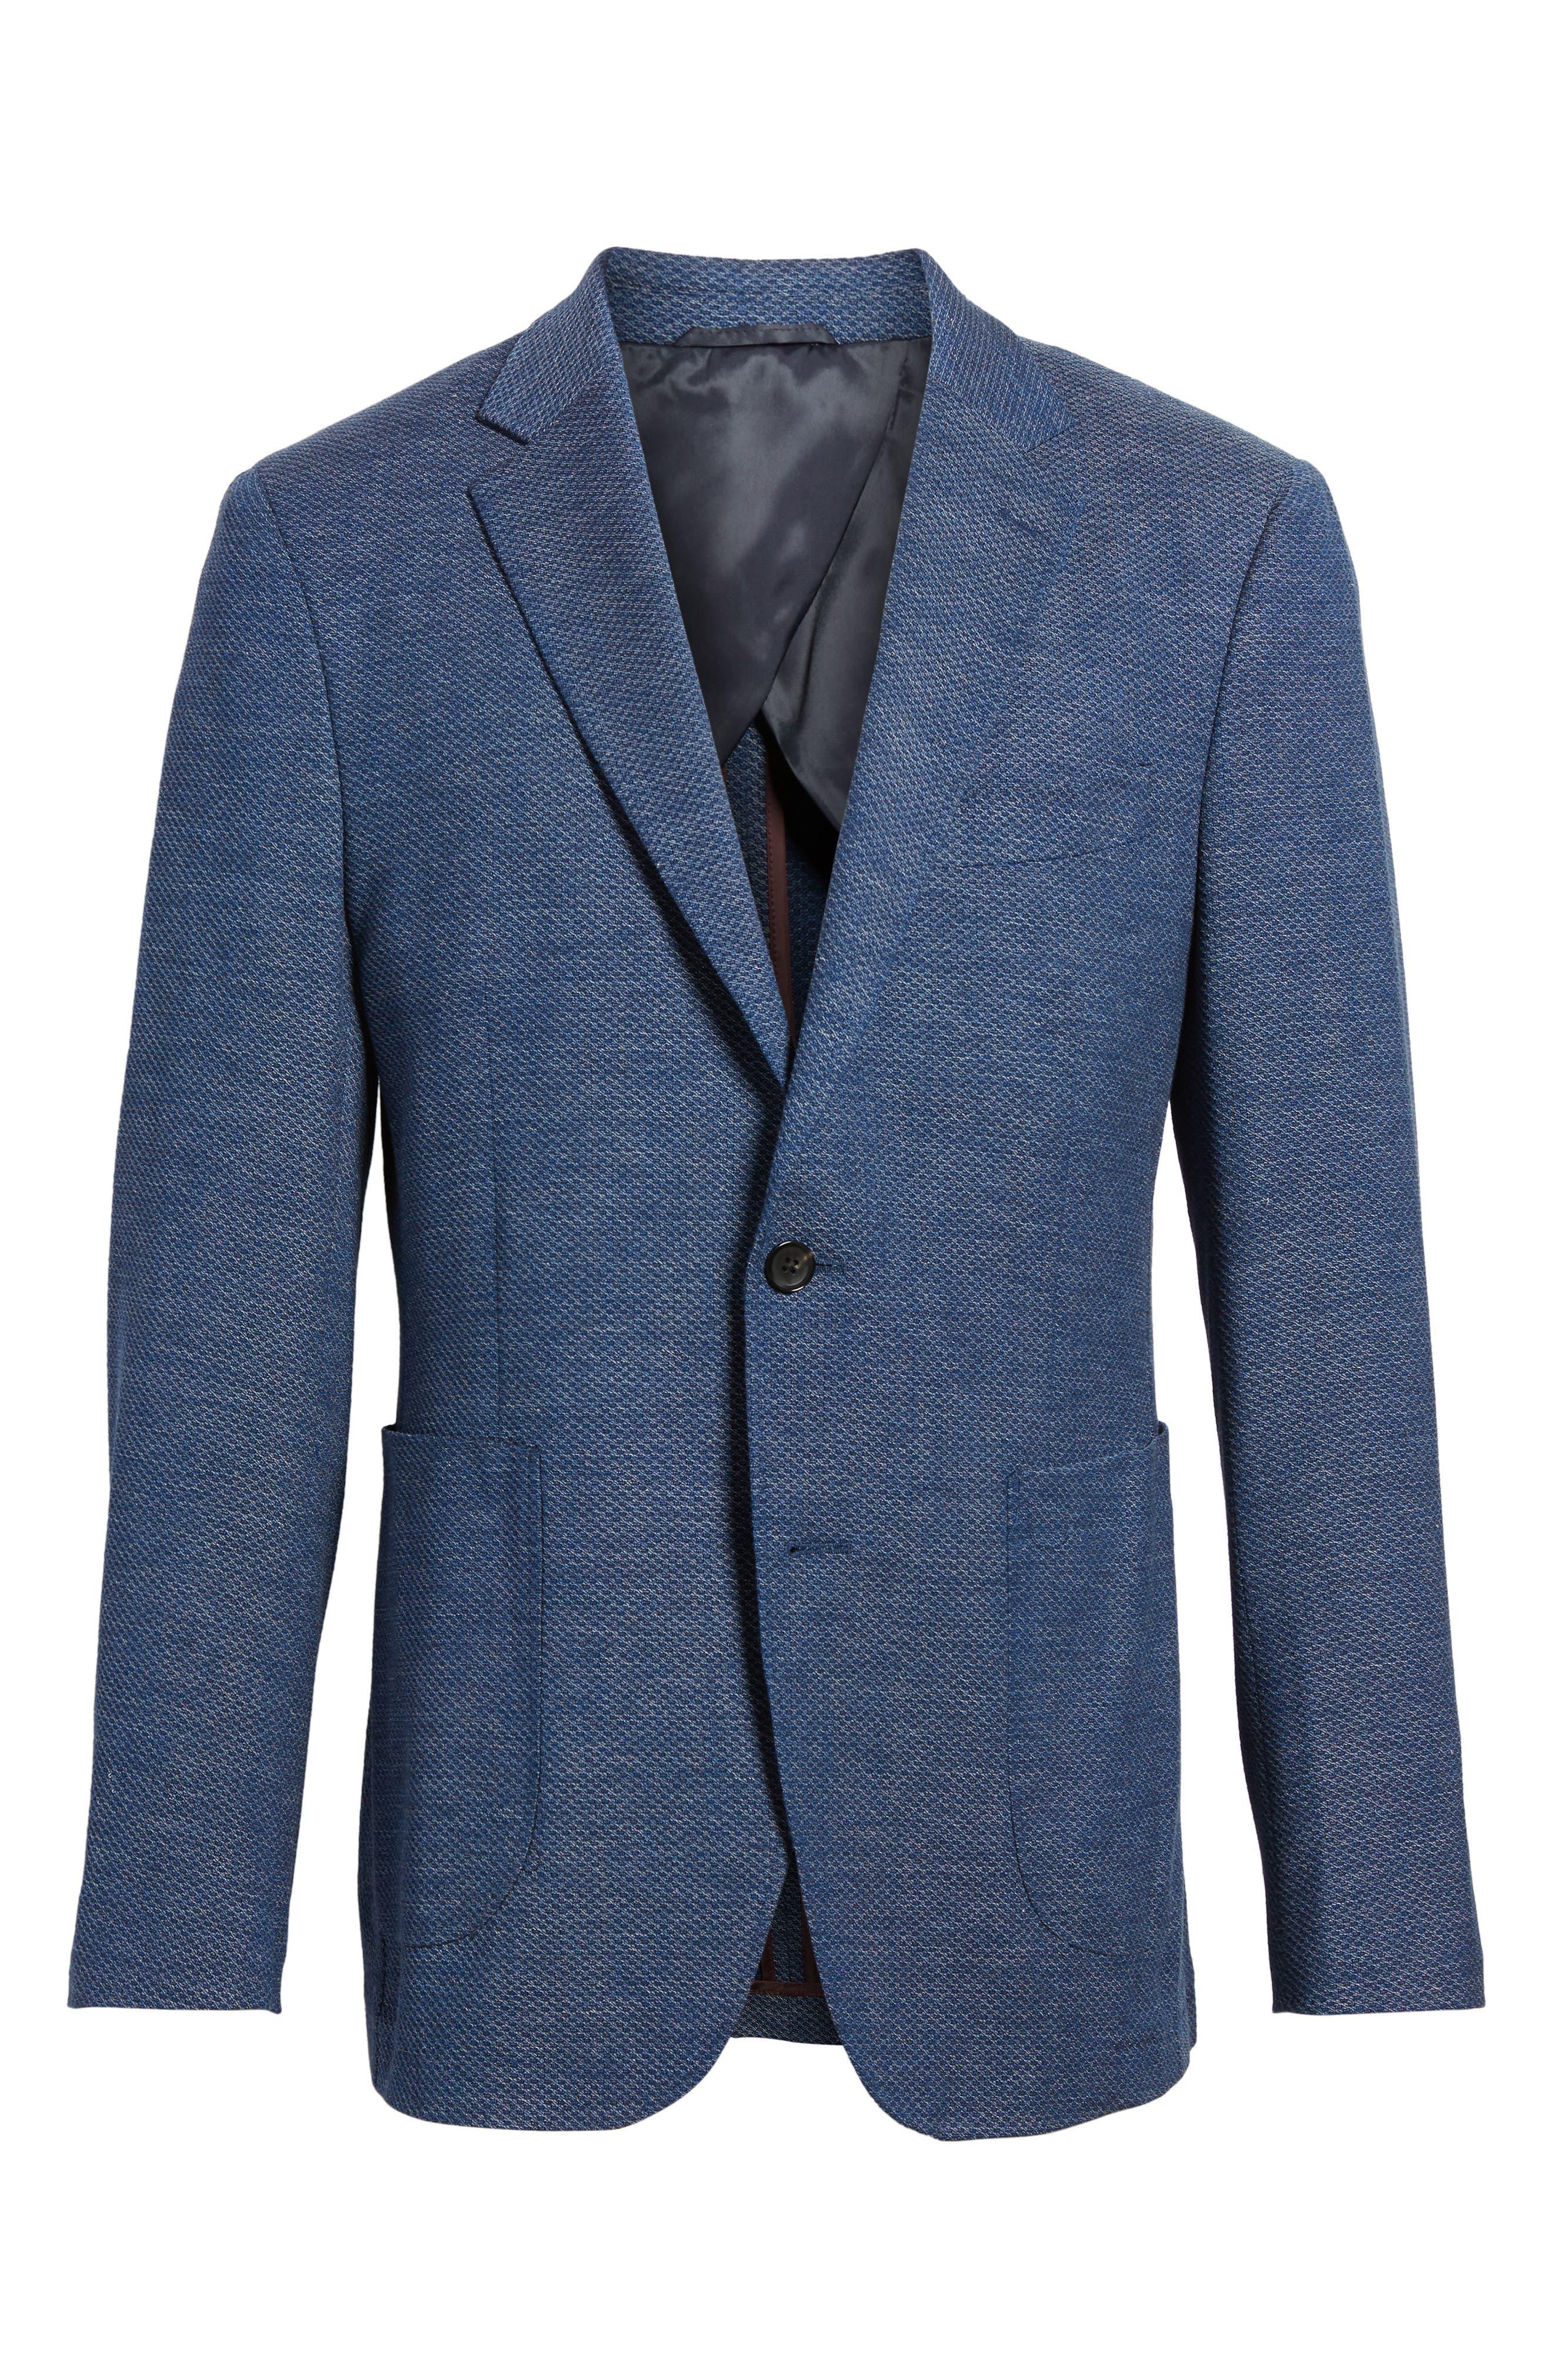 Fife Street Wool Blend Blazer,                             Alternate thumbnail 6, color,                             Marine